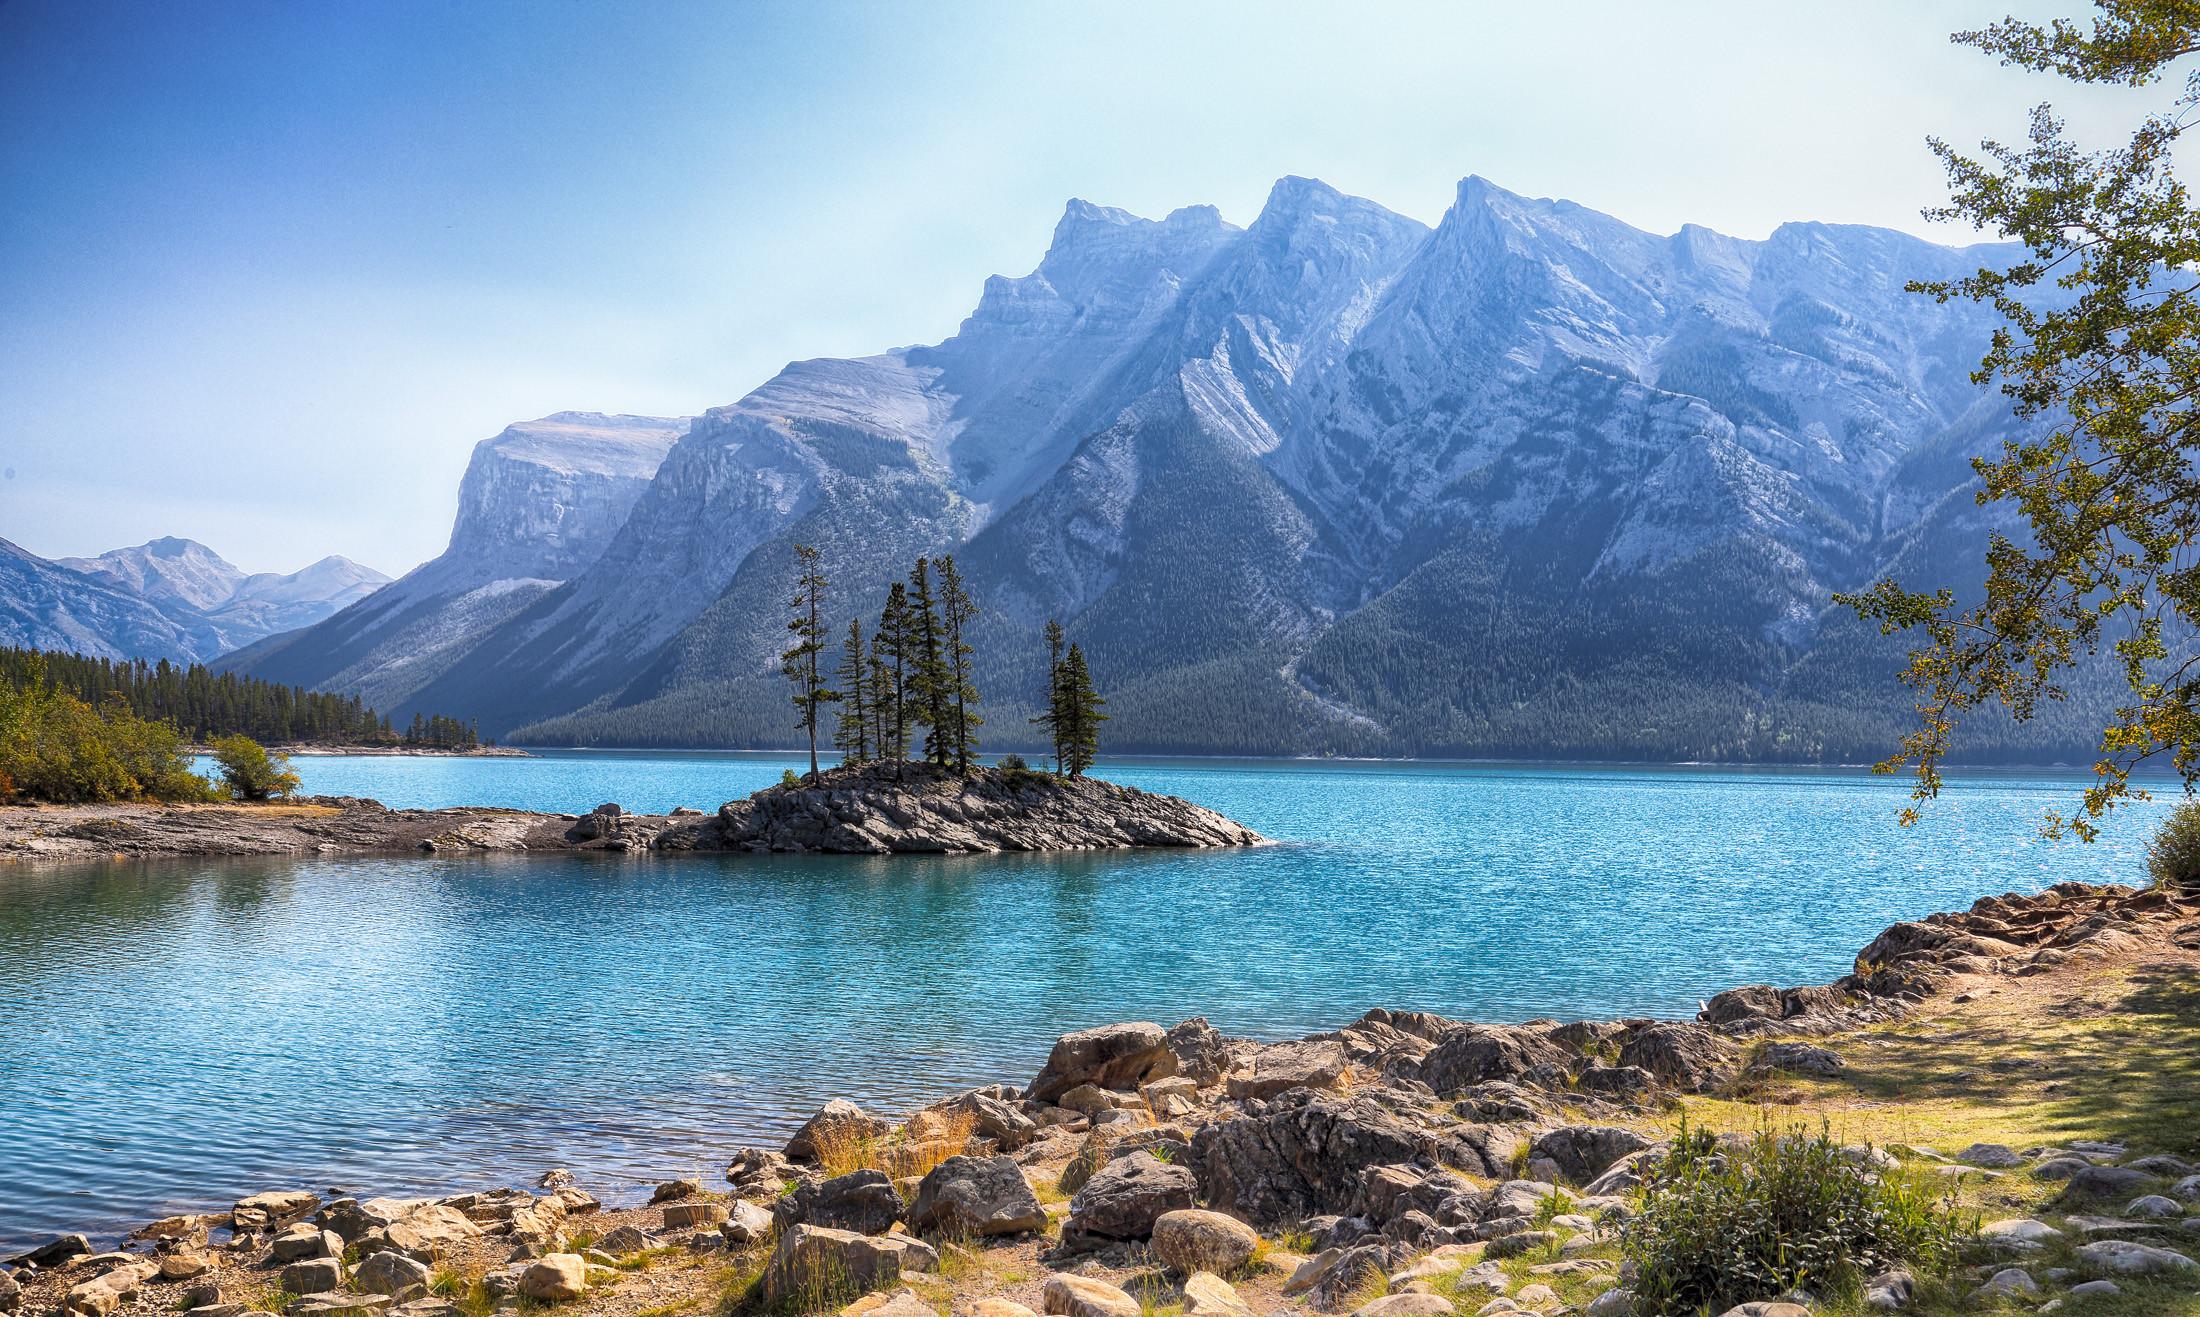 обои Озеро, Minnewanka, Банф, Альберта картинки фото